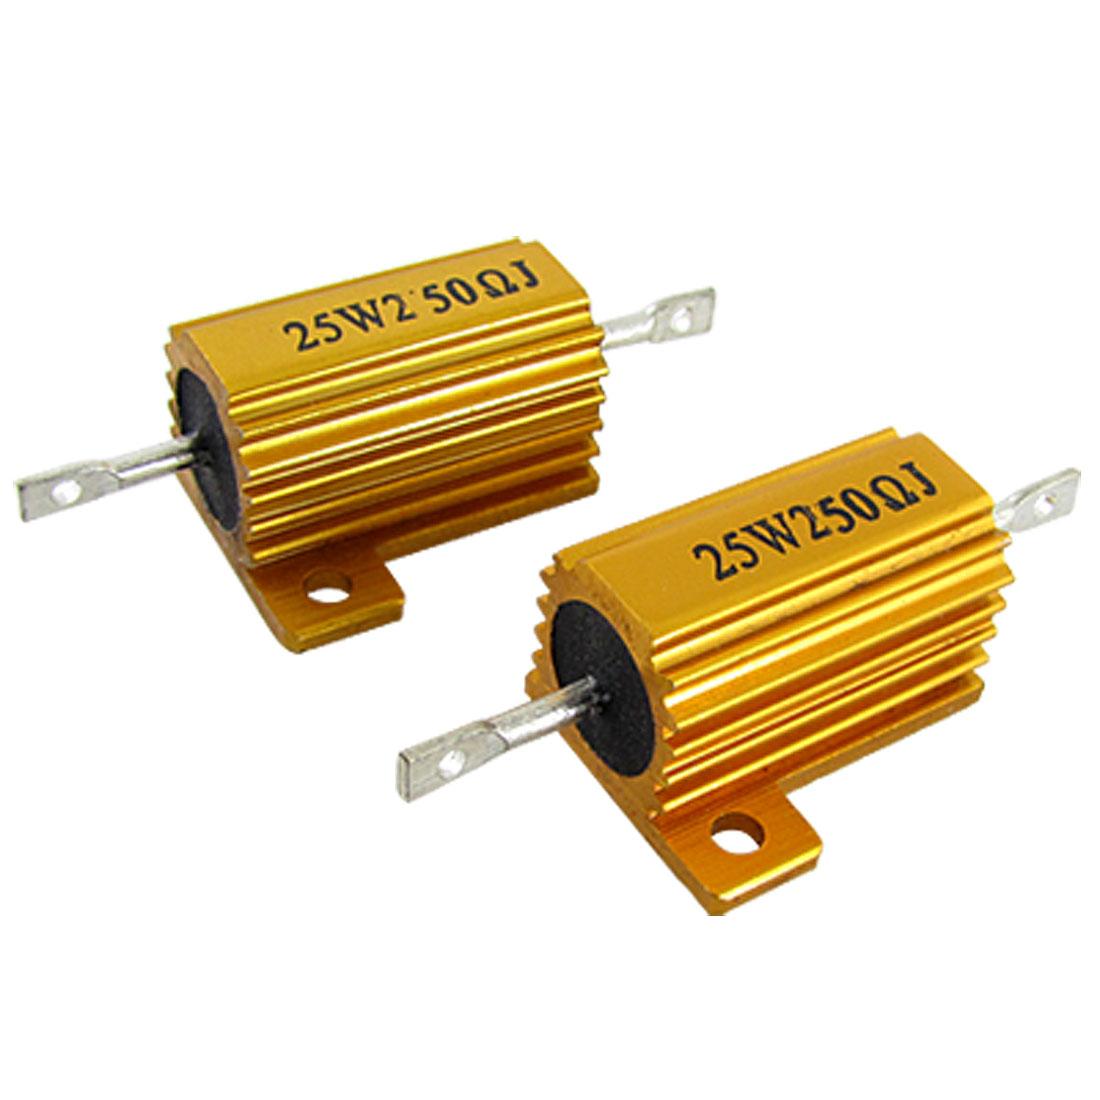 Wirewound Aluminium Case Housed Resistor 5% 25W 250 ohm 2pcs